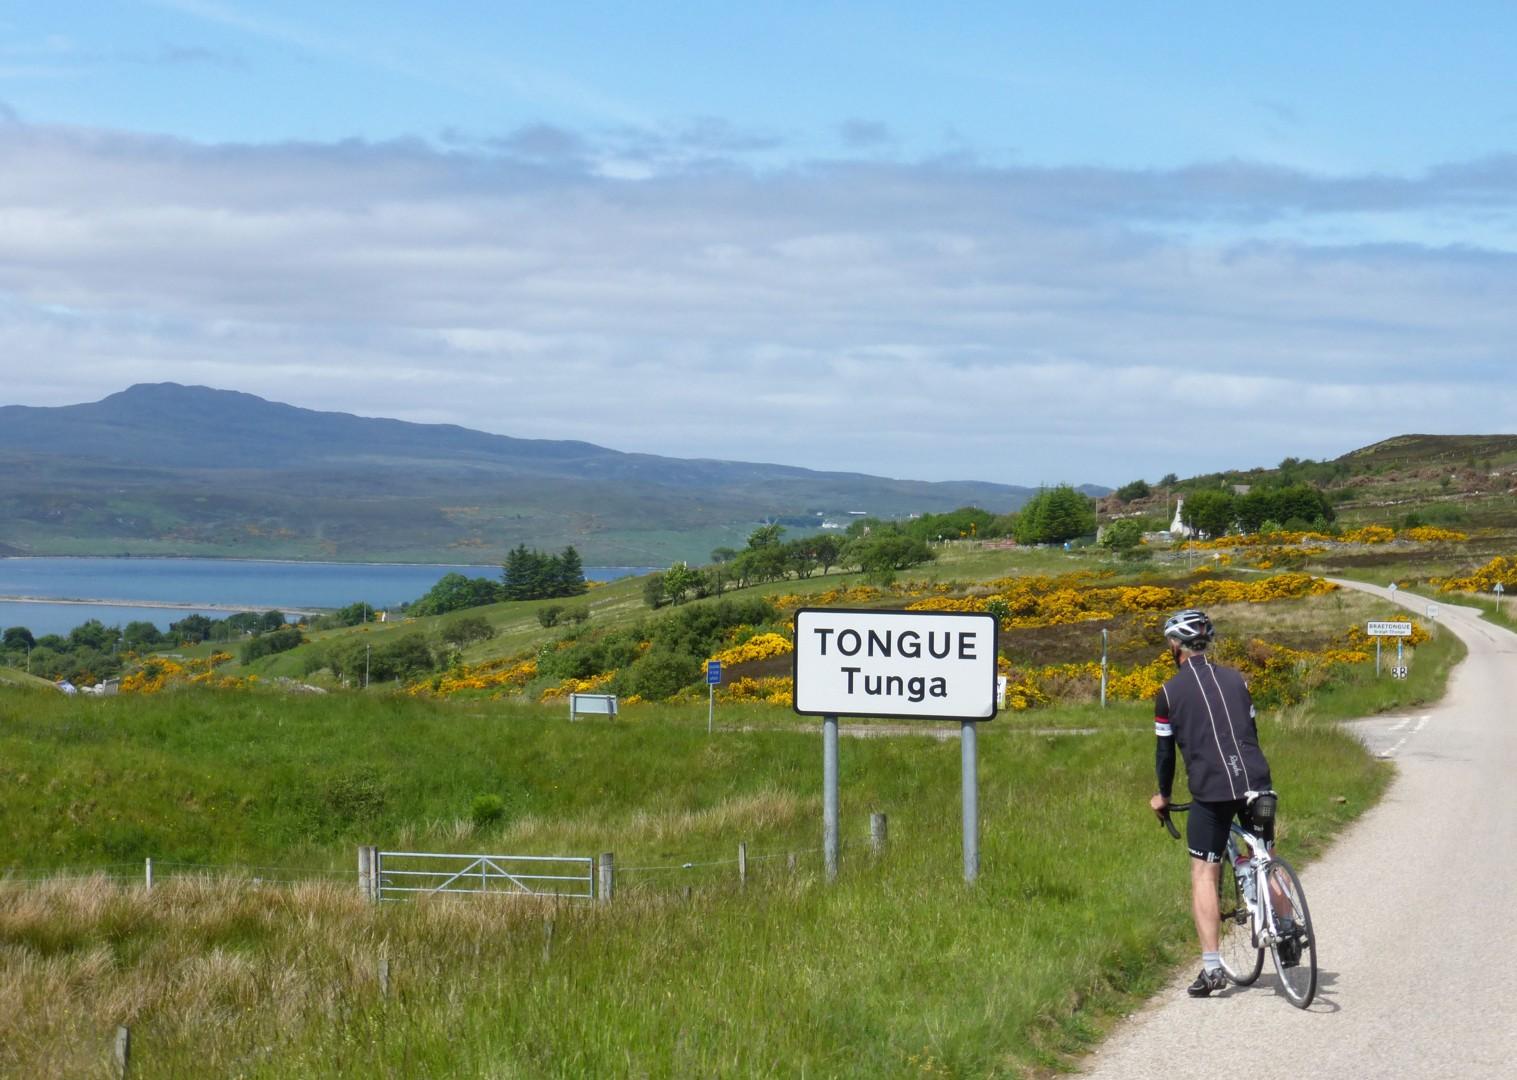 tounge-lands-end-john-ogroats-cycling.jpg - UK - Land's End to John O'Groats Explorer (22 days) - Guided Cycling Holiday - Road Cycling